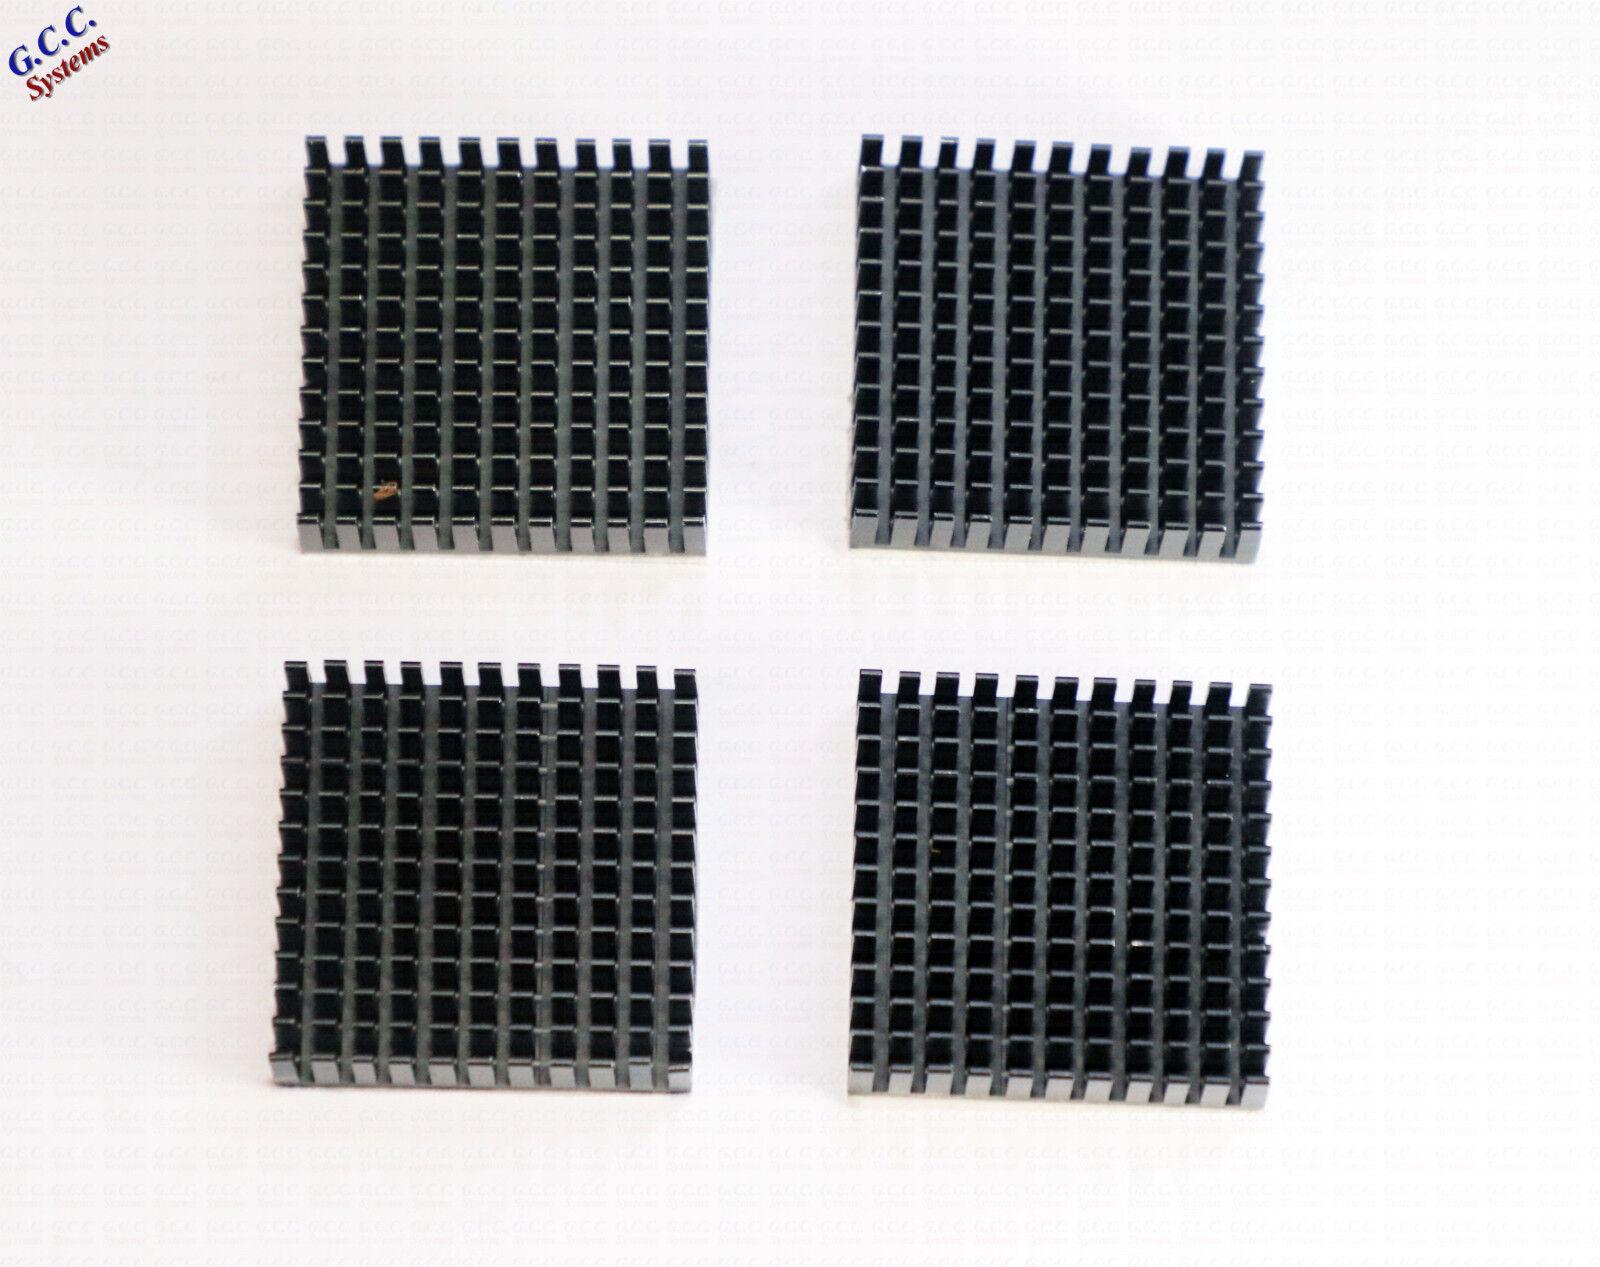 4x 3D Printer NEMA17 42 Stepper Motor Heatsinks With Adhesive Backing